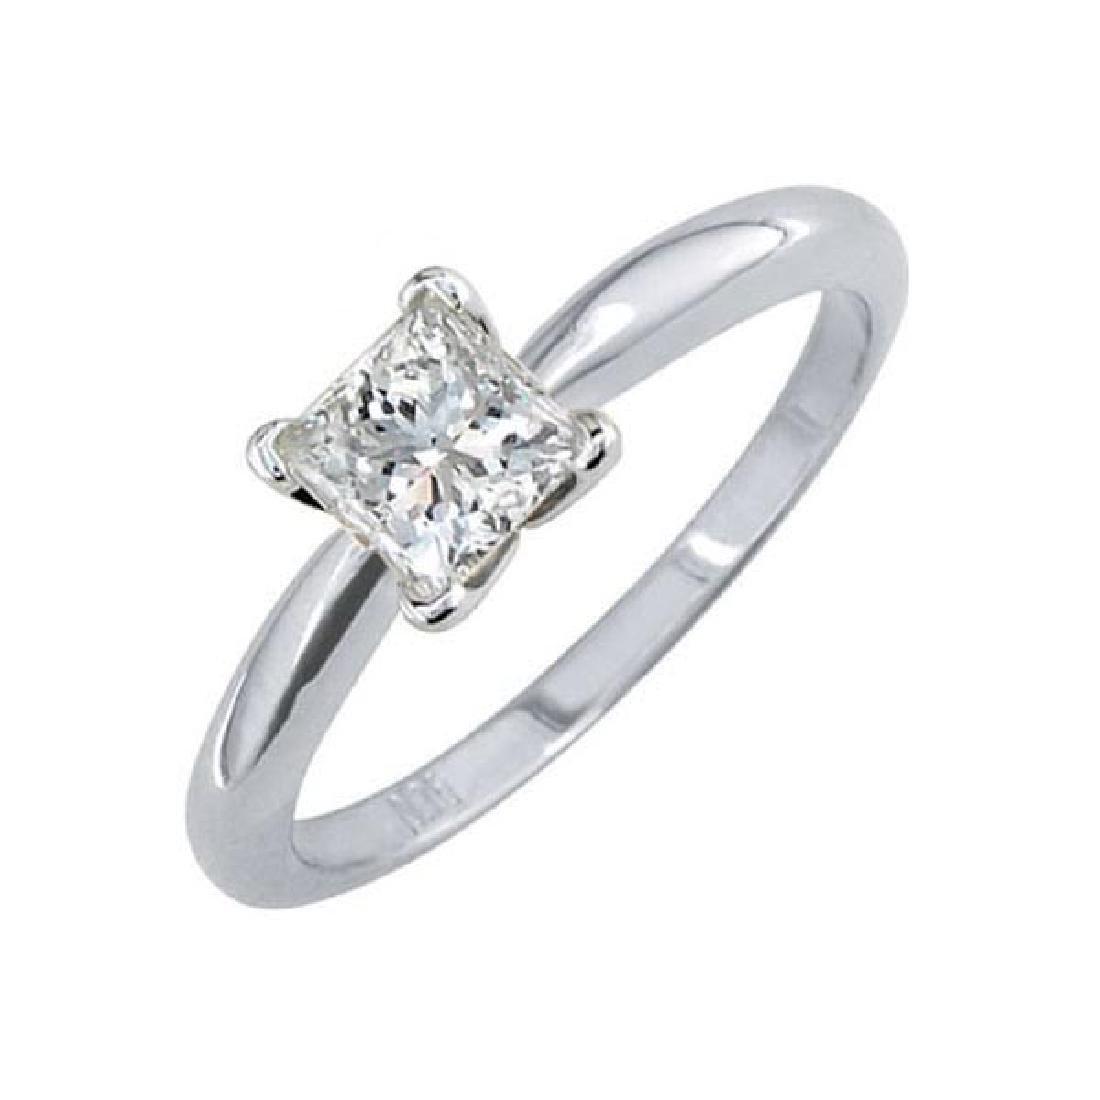 Certified 0.48 CTW Princess Diamond Solitaire 14k Ring